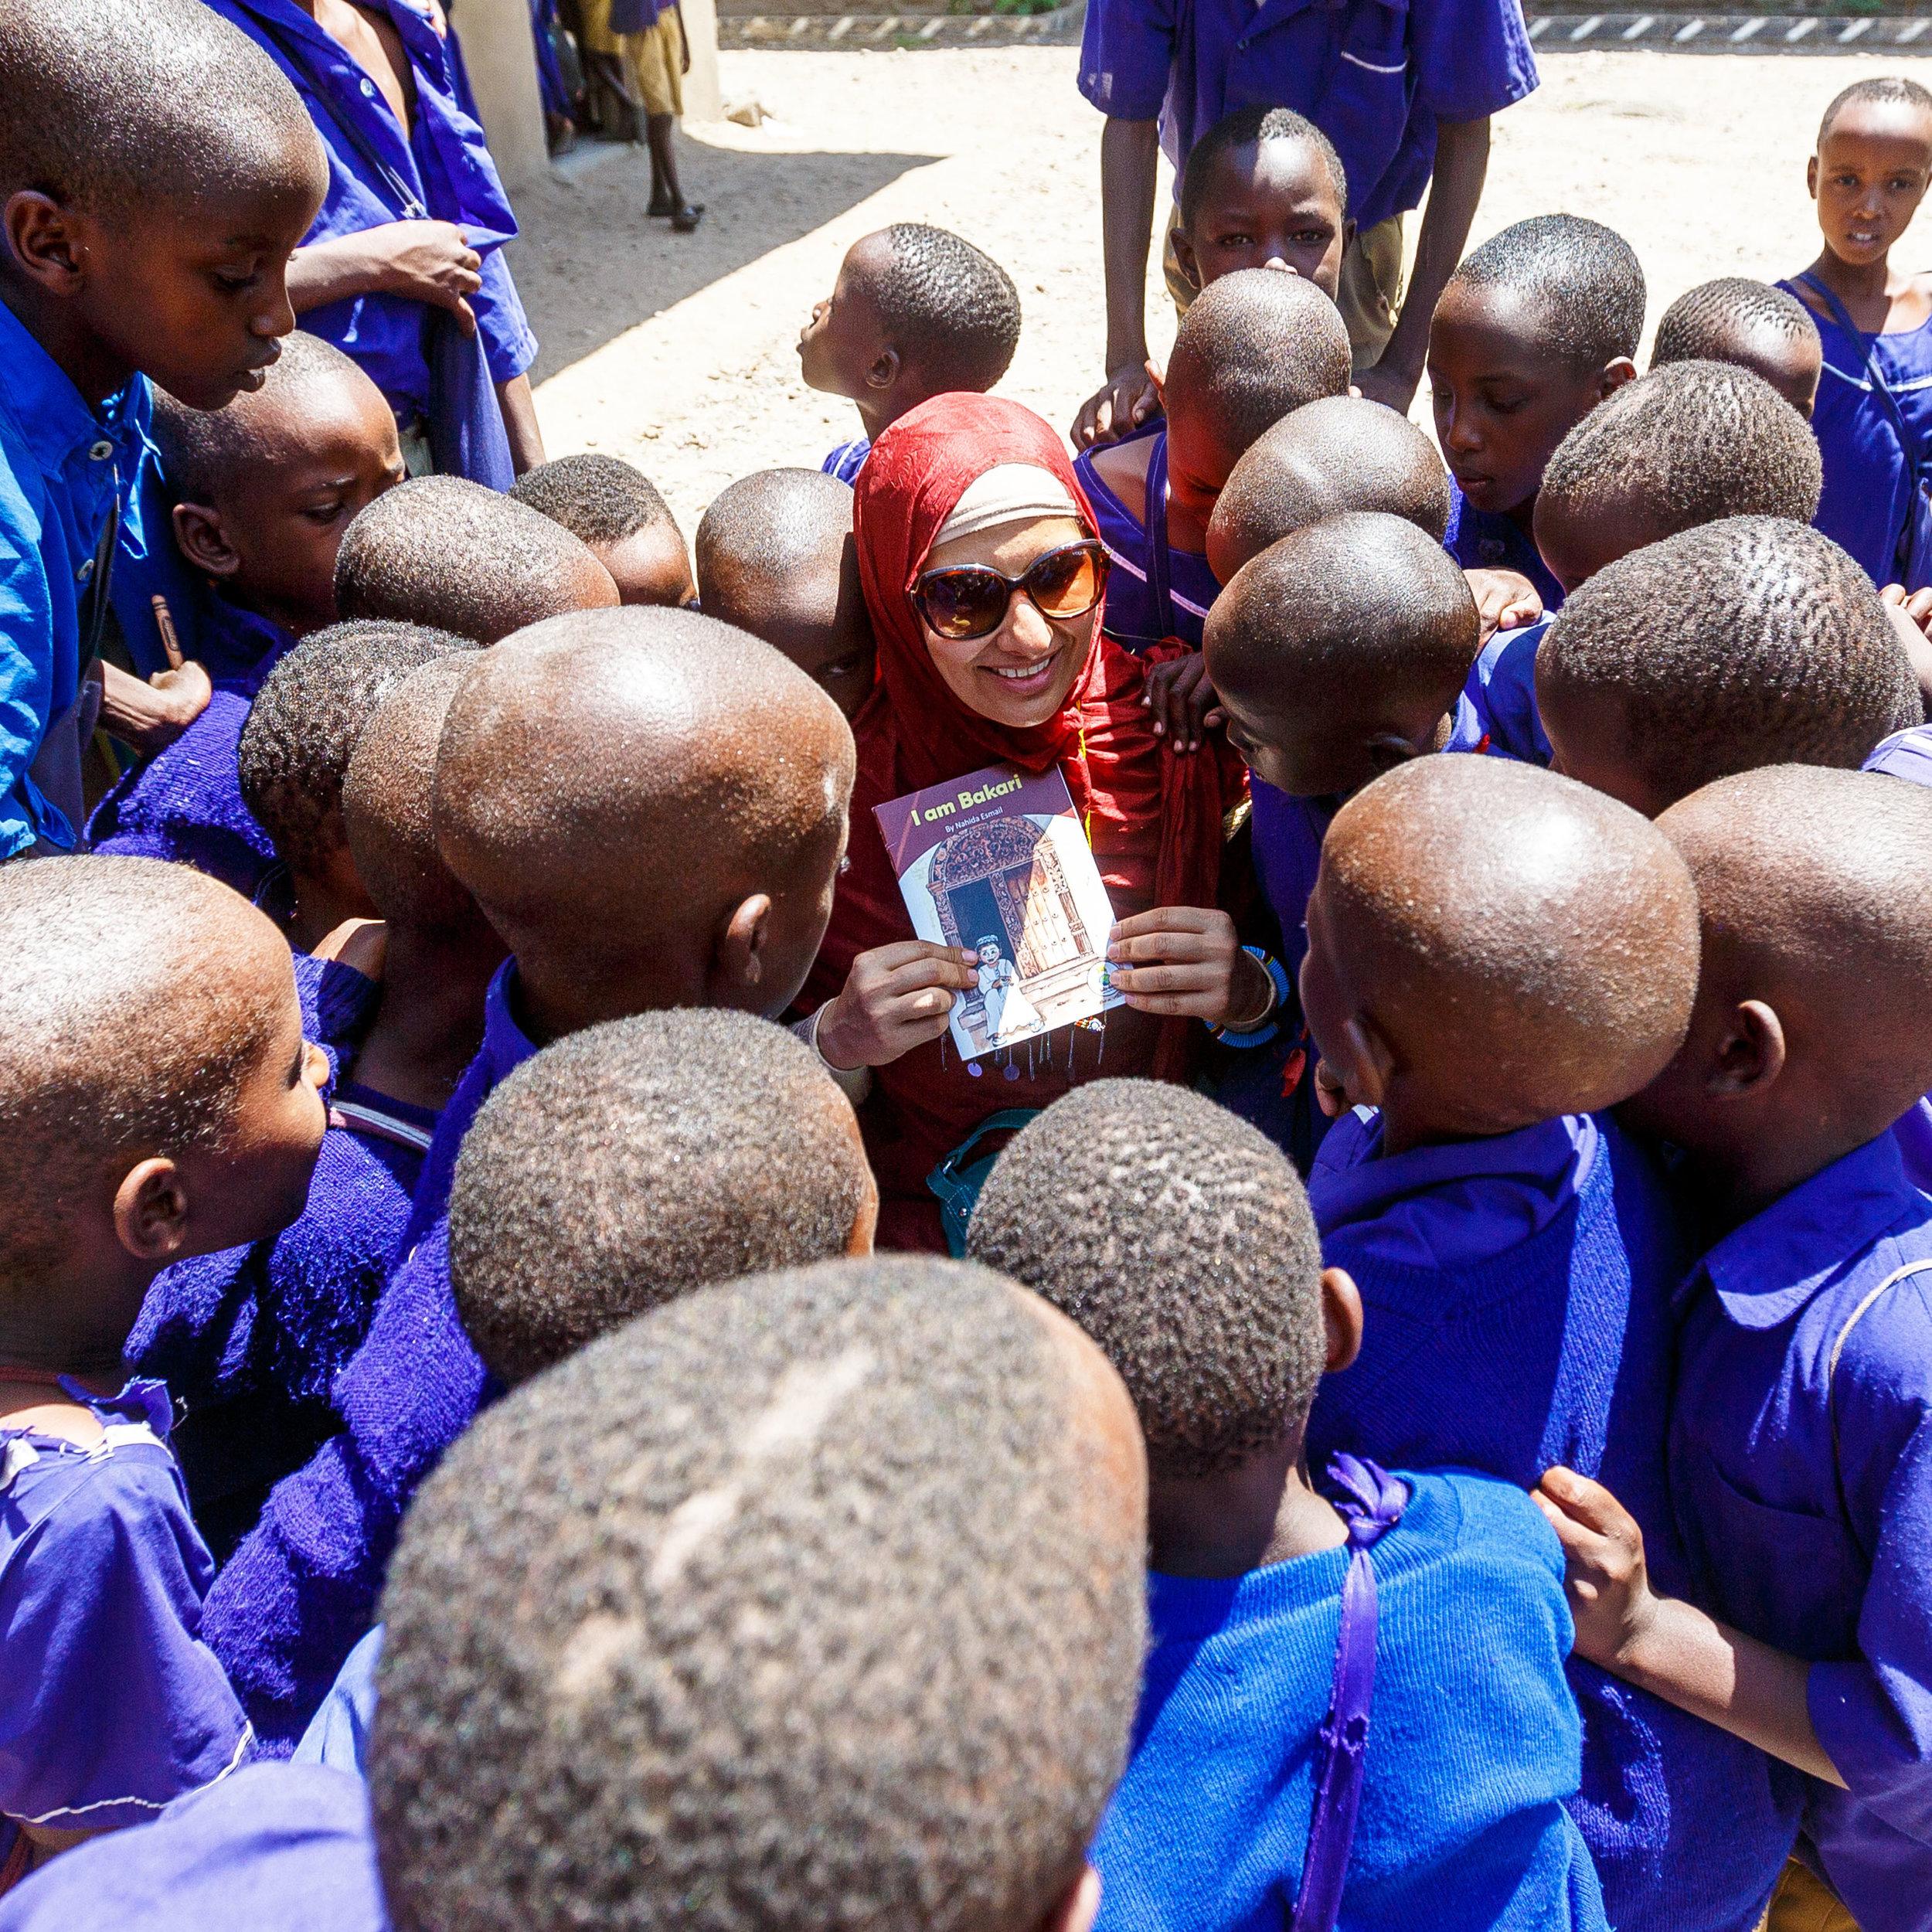 Showing children one of my books in Ketumbeine, Tanzania